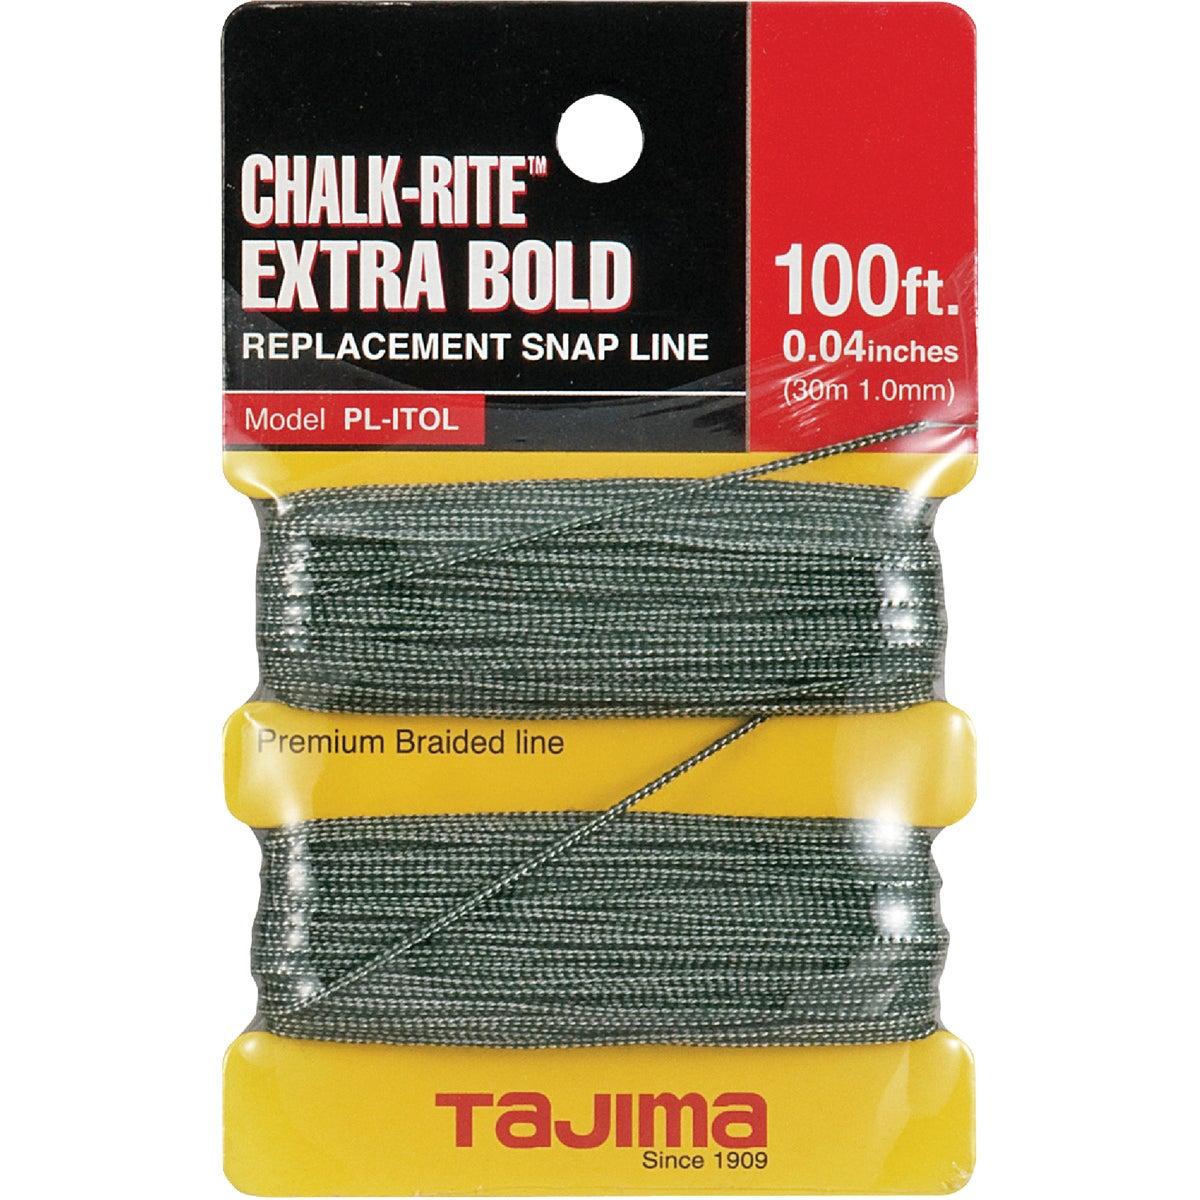 EXTRA BOLD SNAP LINE - PL-ITOL by Tajima Tool Corp